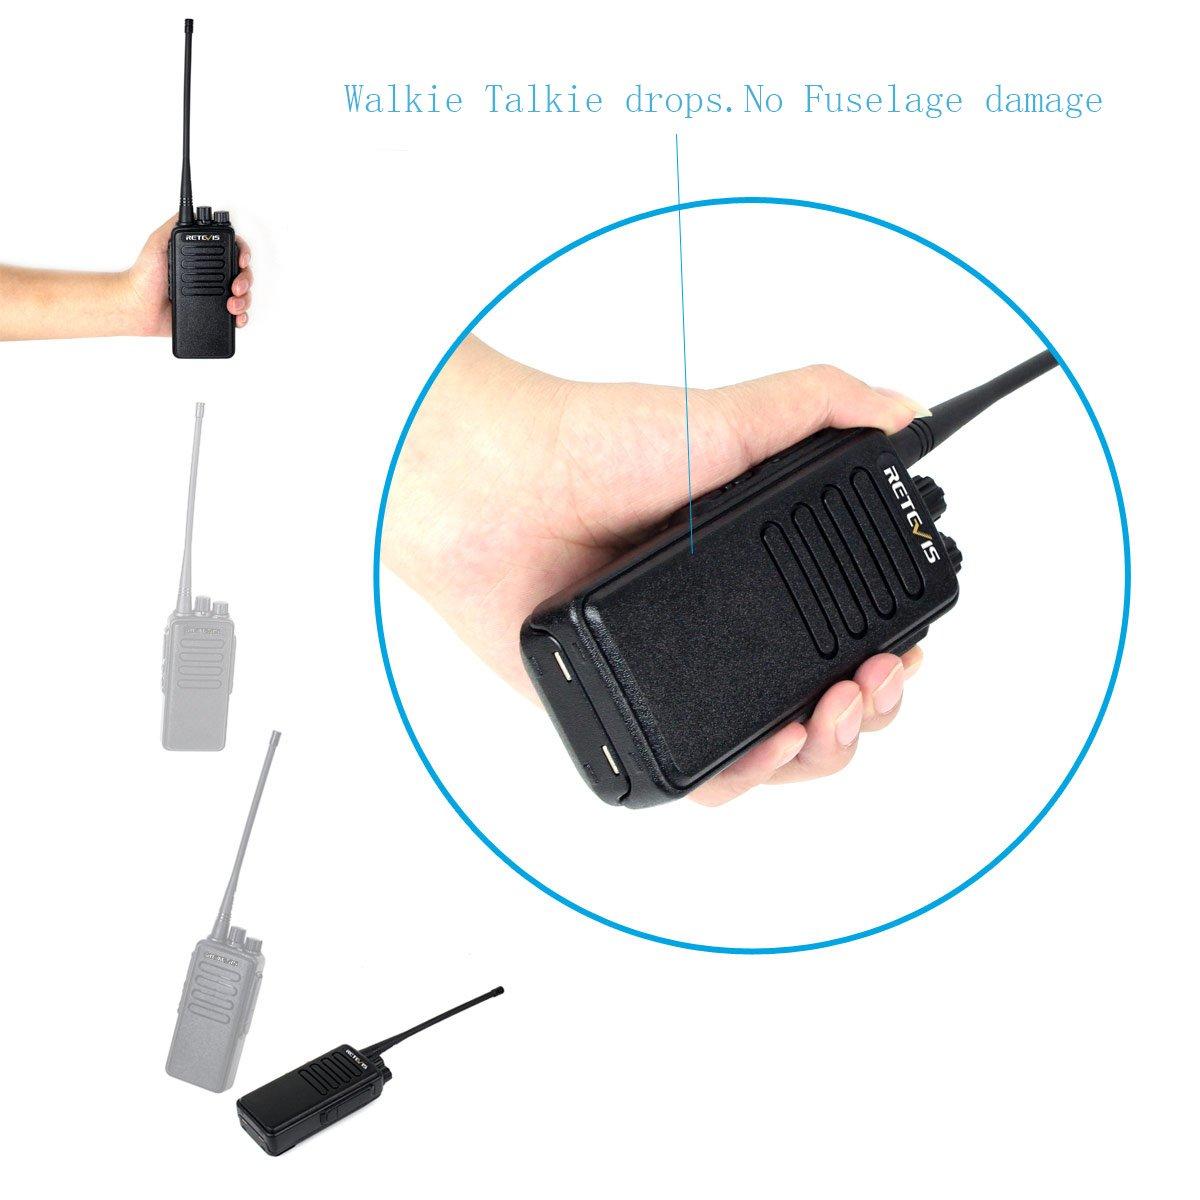 Retevis RT1 10W UHF Two Way Radio 70CM 400-520 MHz 16CH VOX Scrambler Ham radio and Speaker Mic (5 Pack) by Retevis (Image #6)